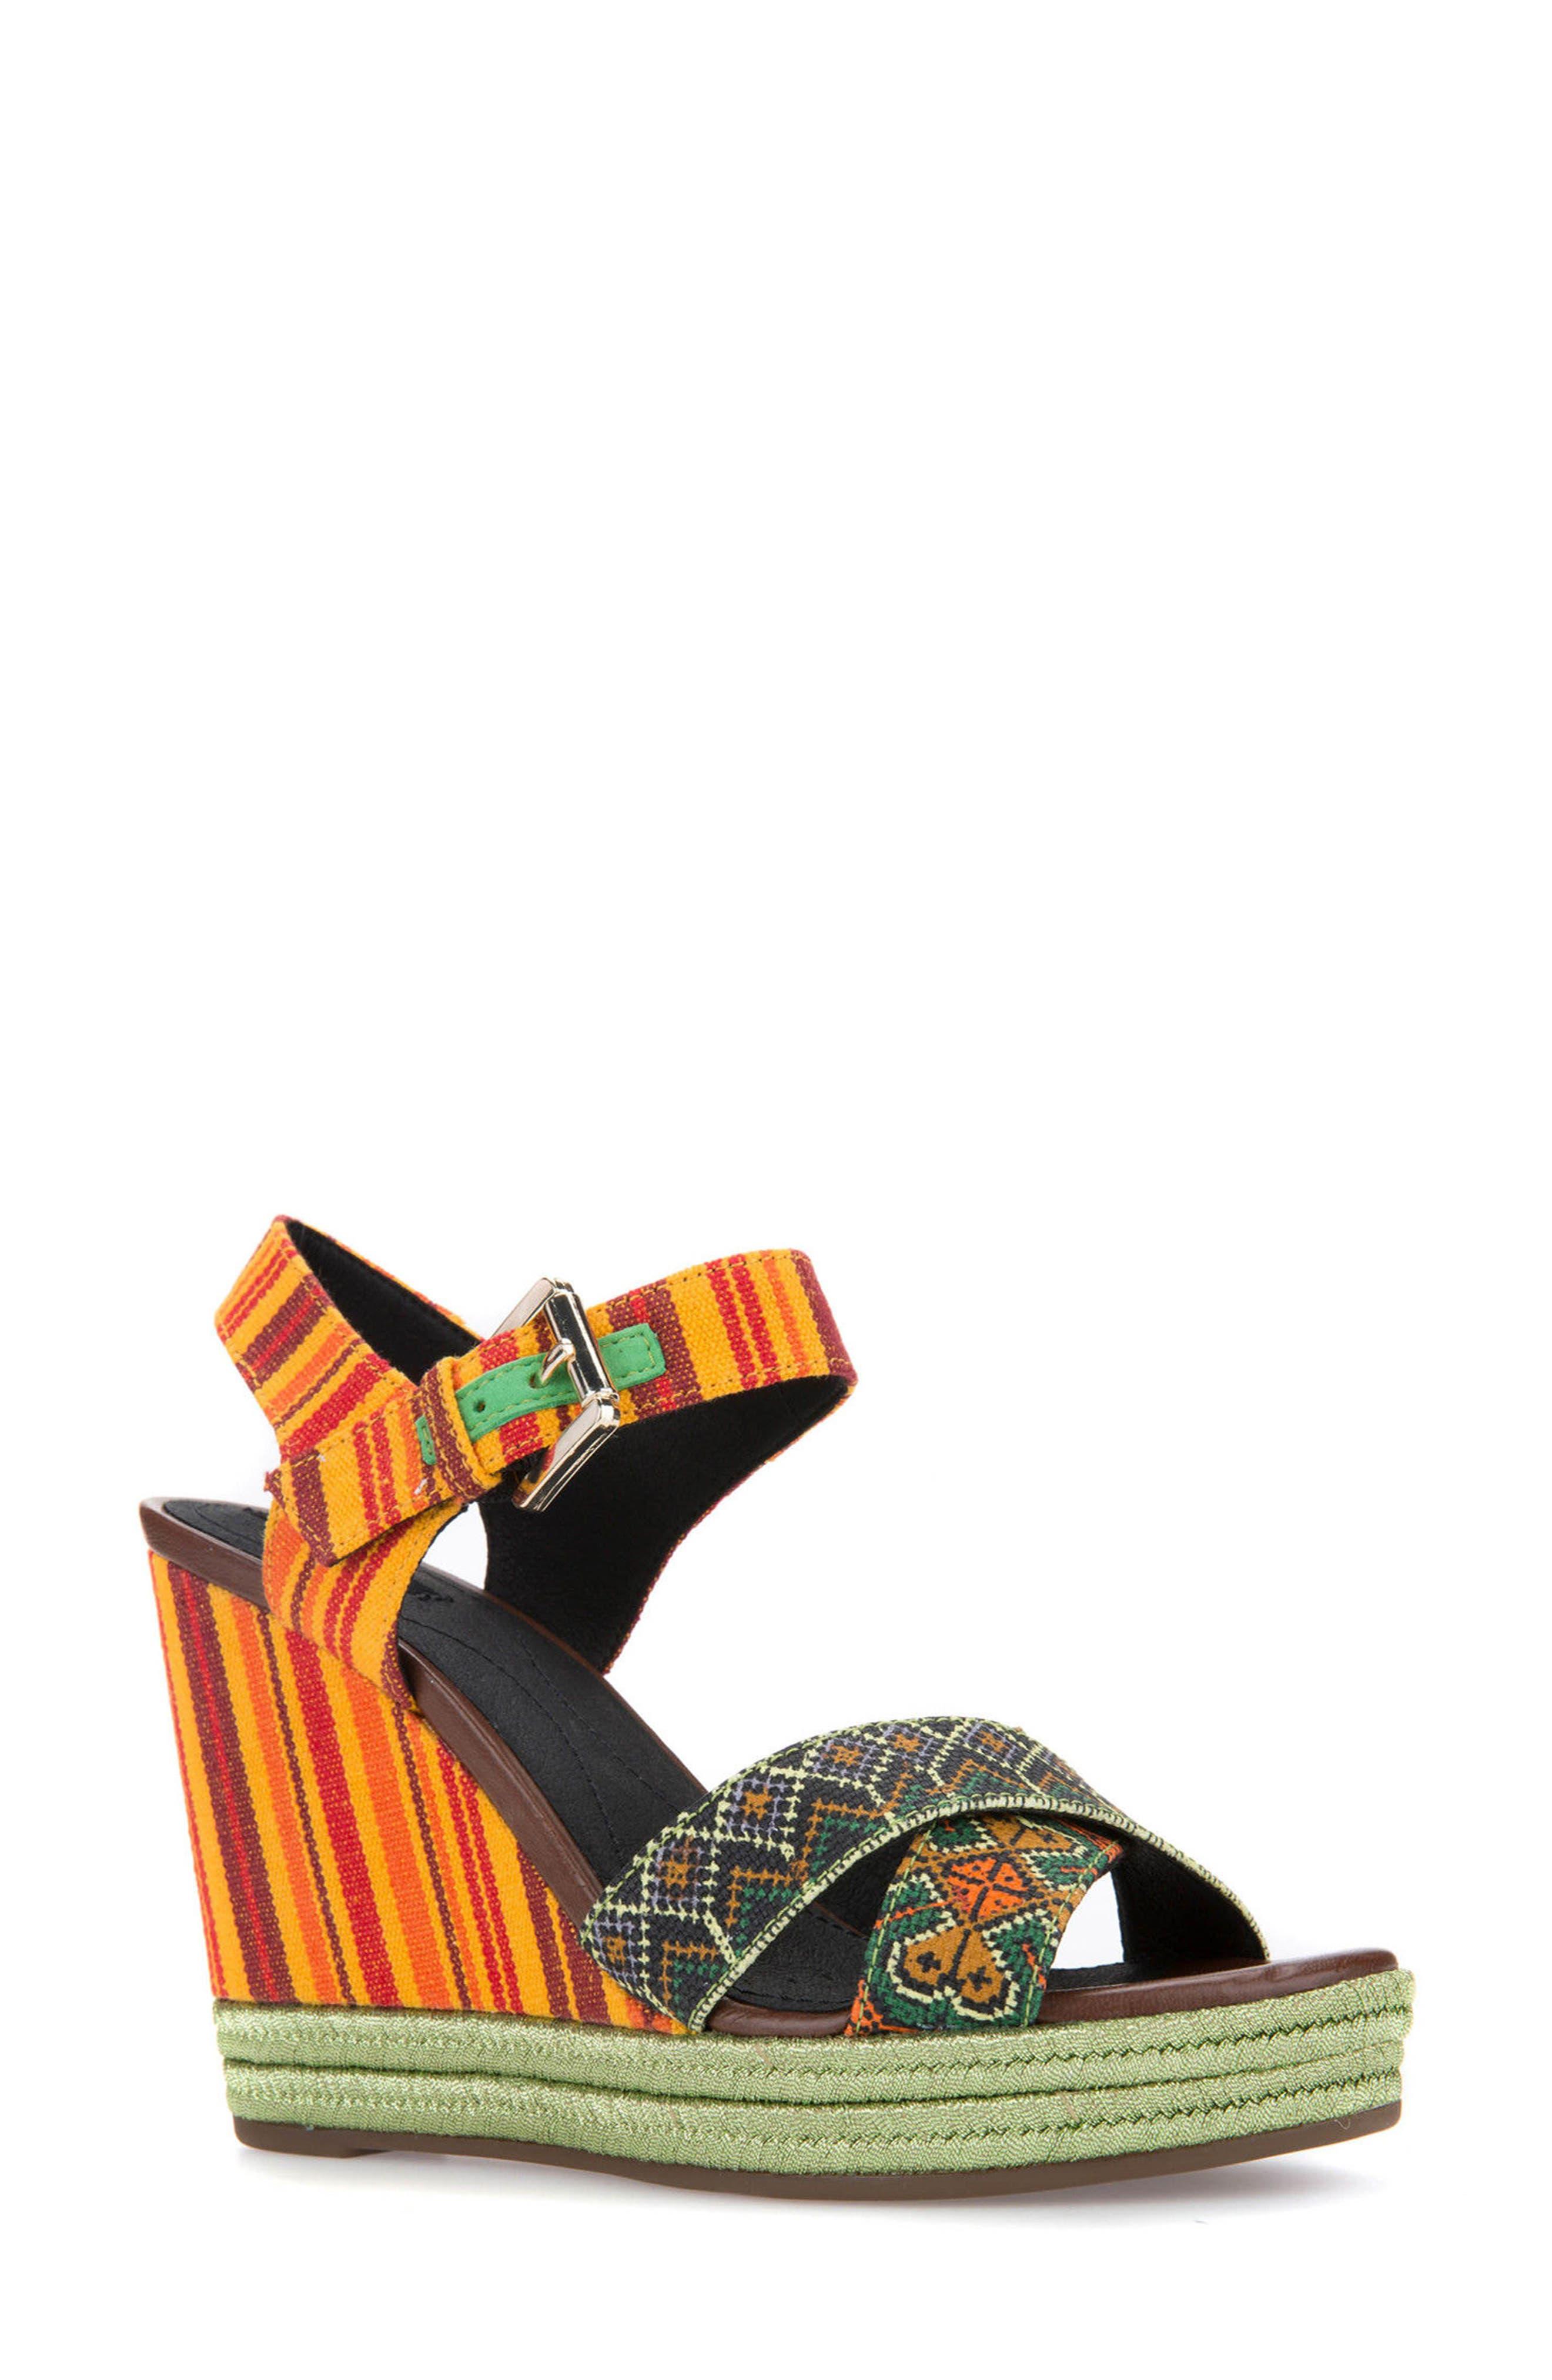 Geox Janira 15 Wedge Sandal (Women)